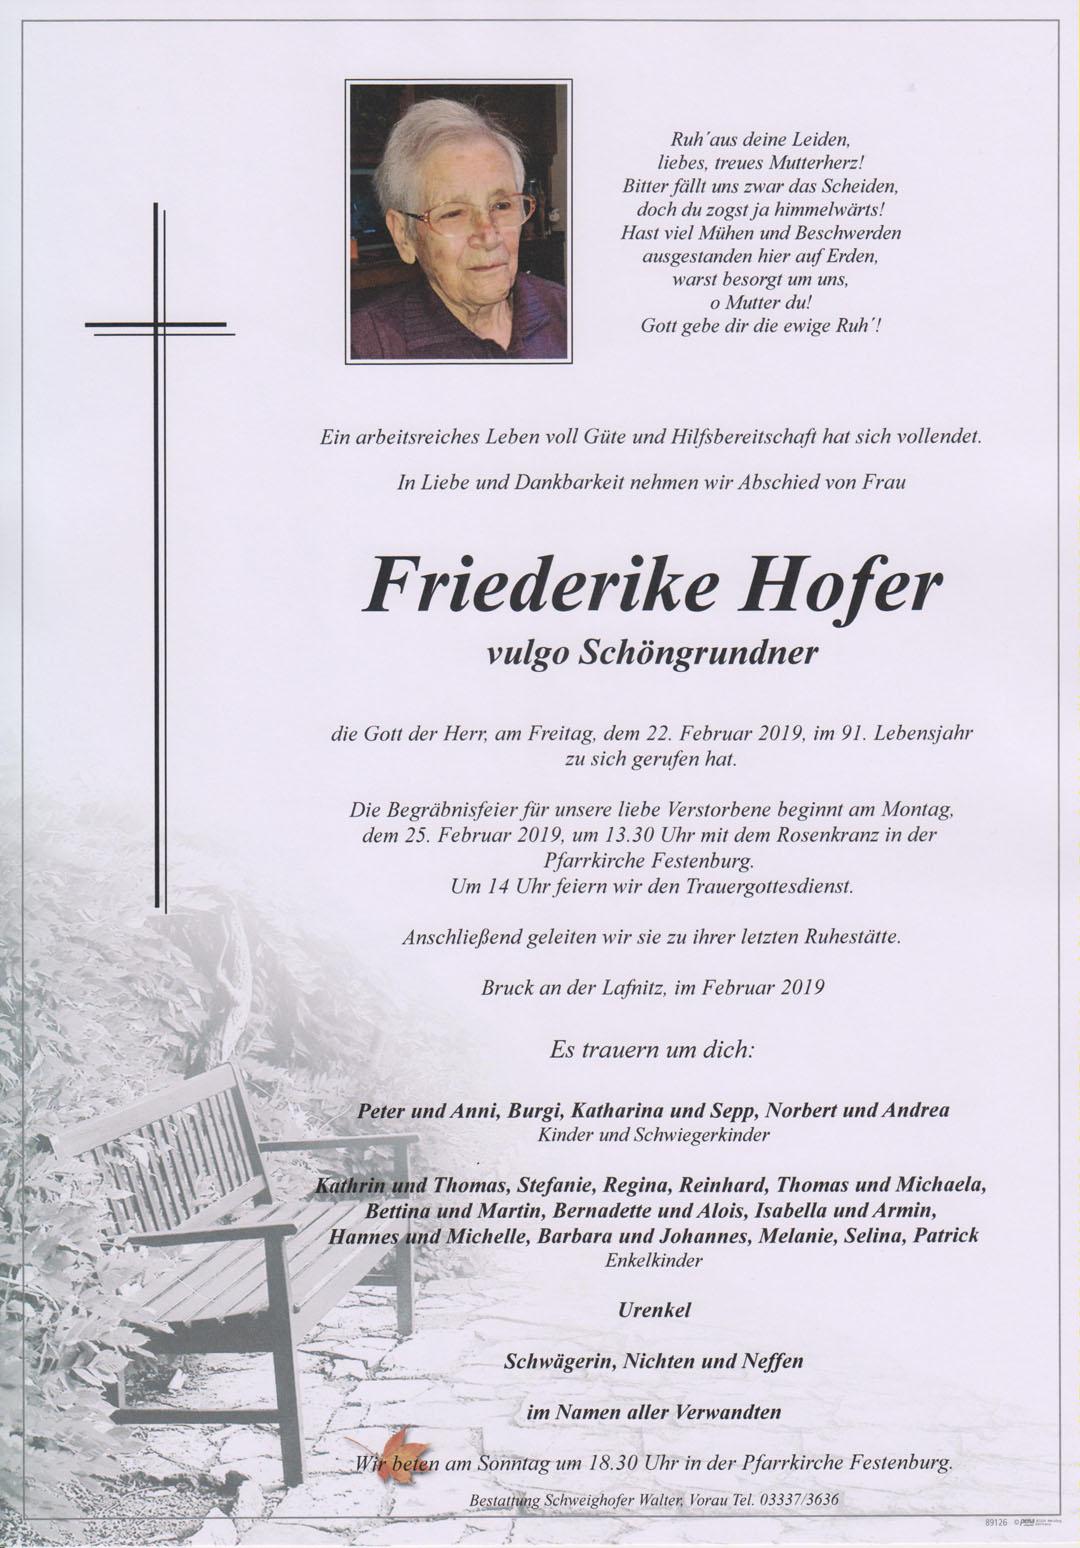 Friederike Hofer